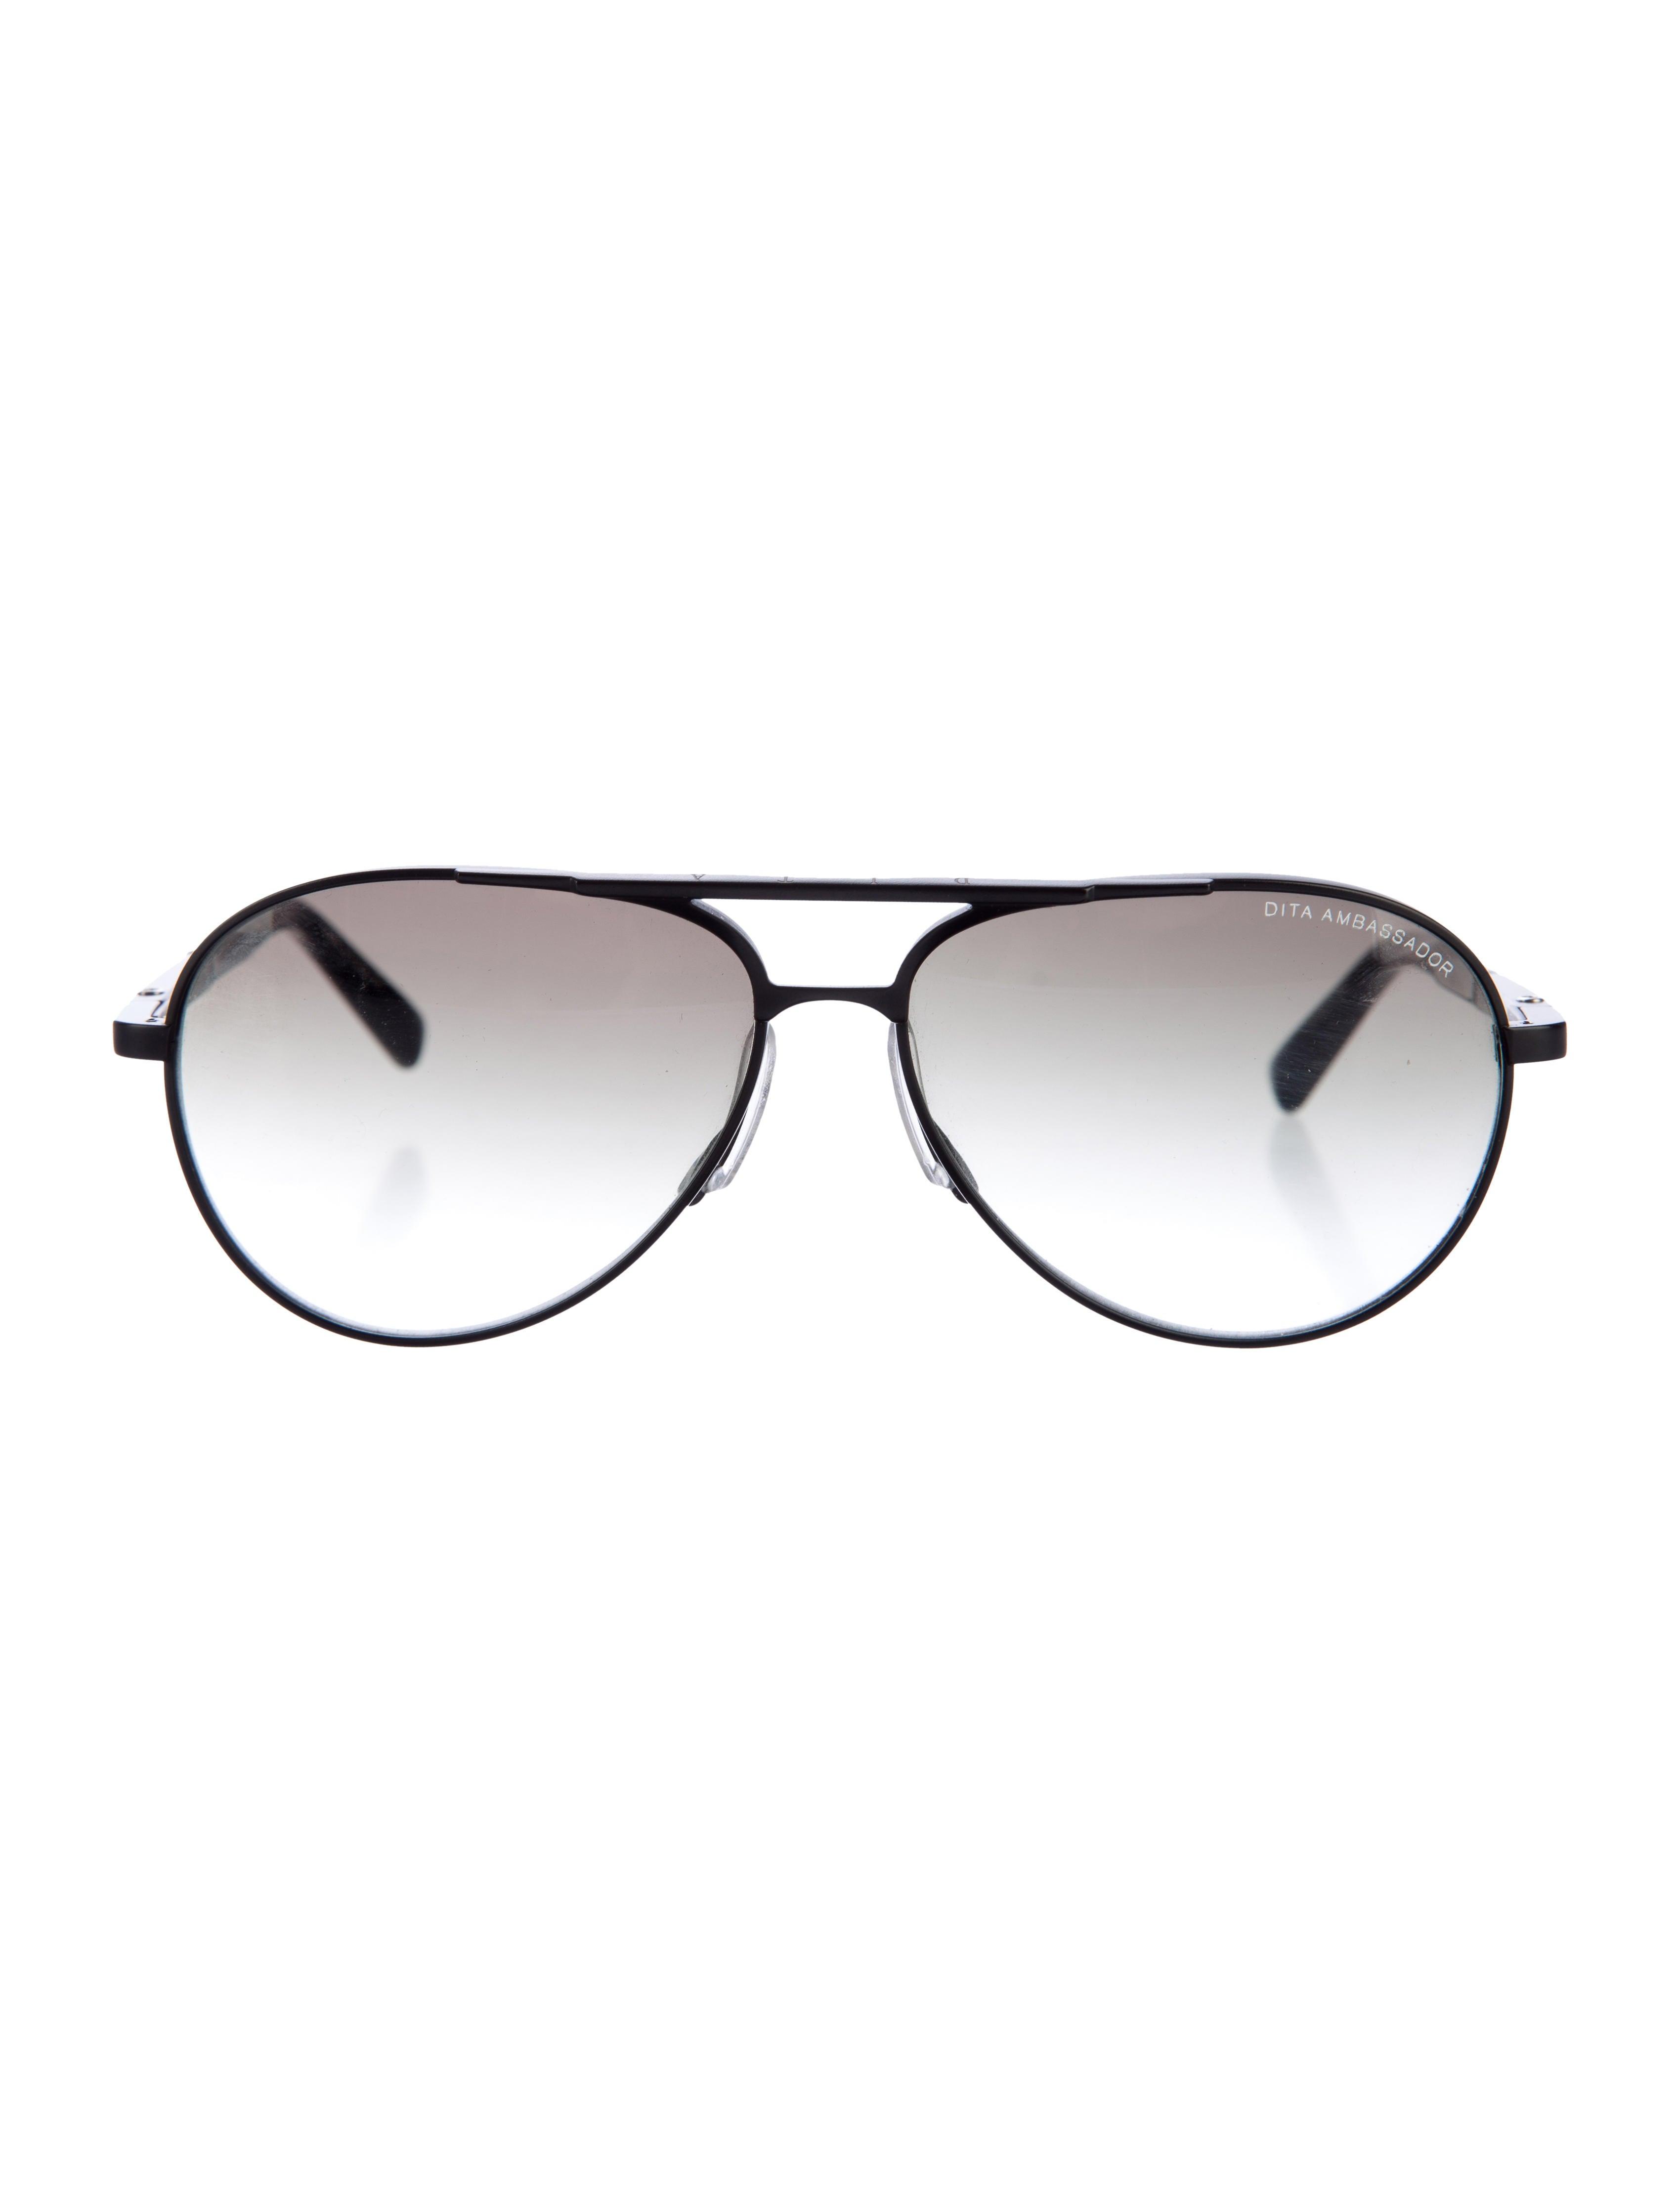 600b22a645e Dita Ambassador Titanium Aviator Sunglasses - Accessories - WDT20562 ...